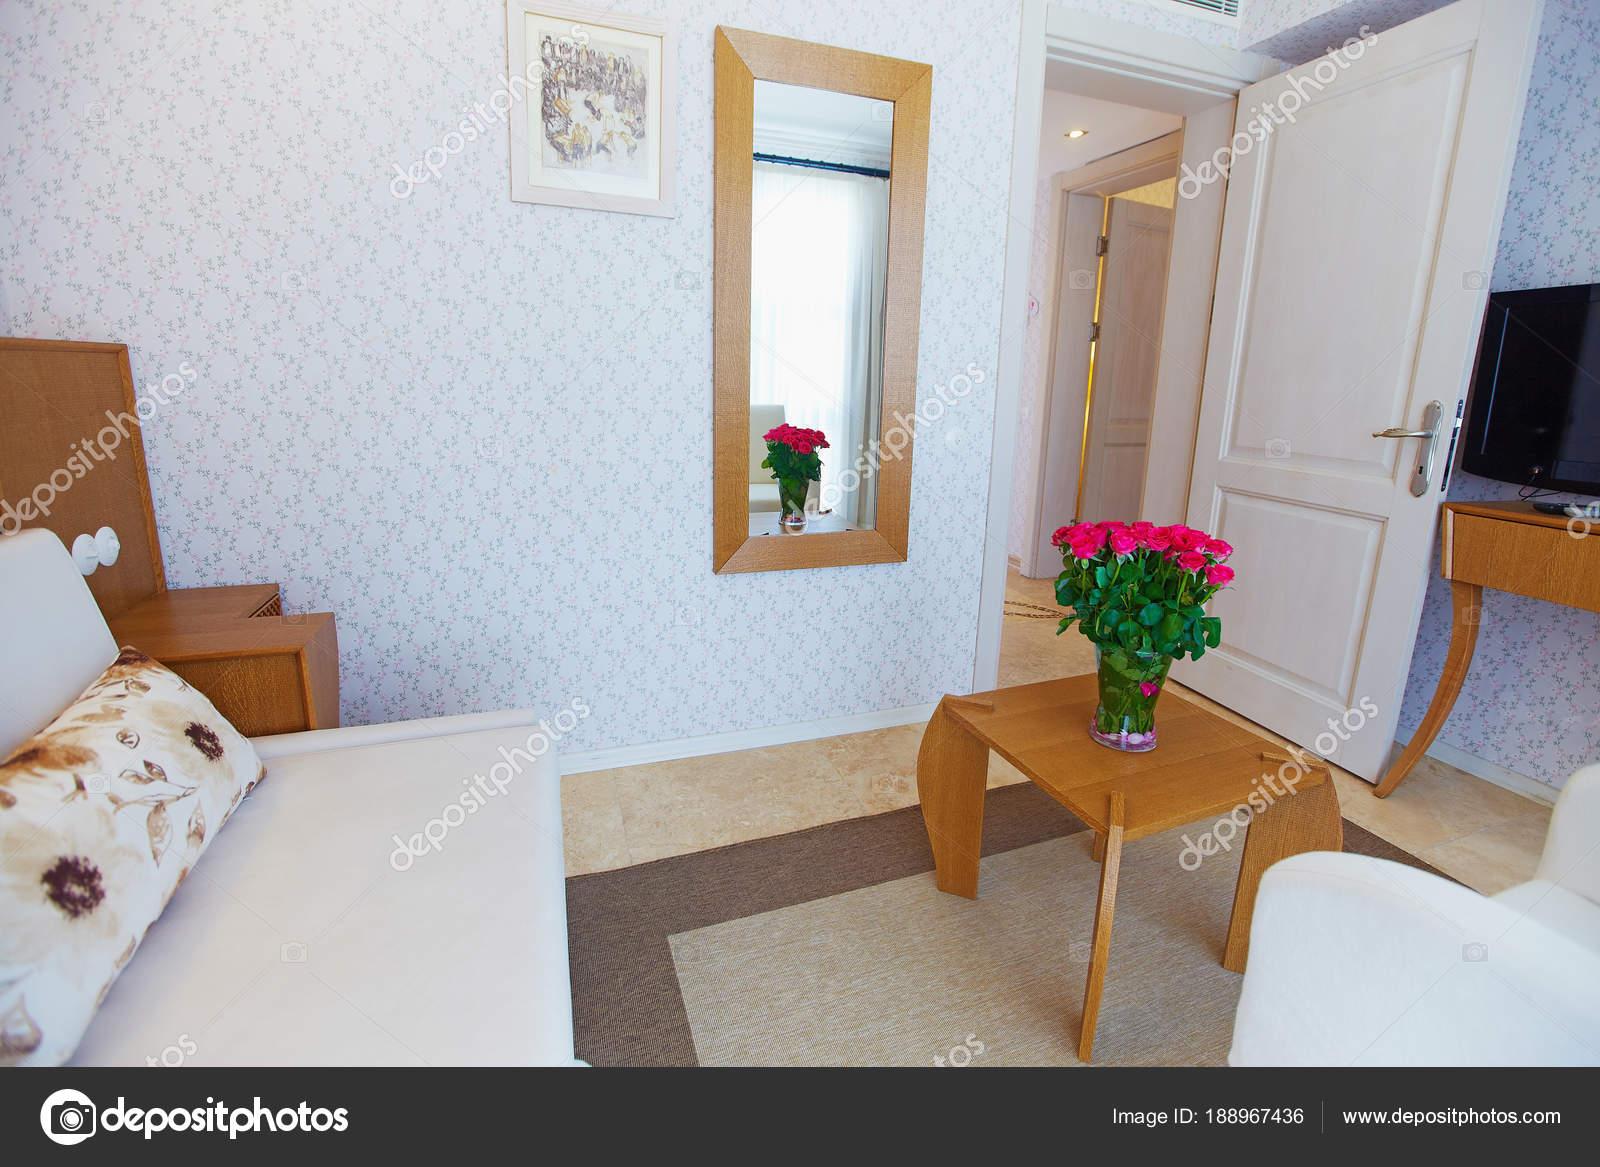 Woonkamer En Slaapkamer : Hotel woonkamer slaapkamer ingericht met rotan meubelen ingericht